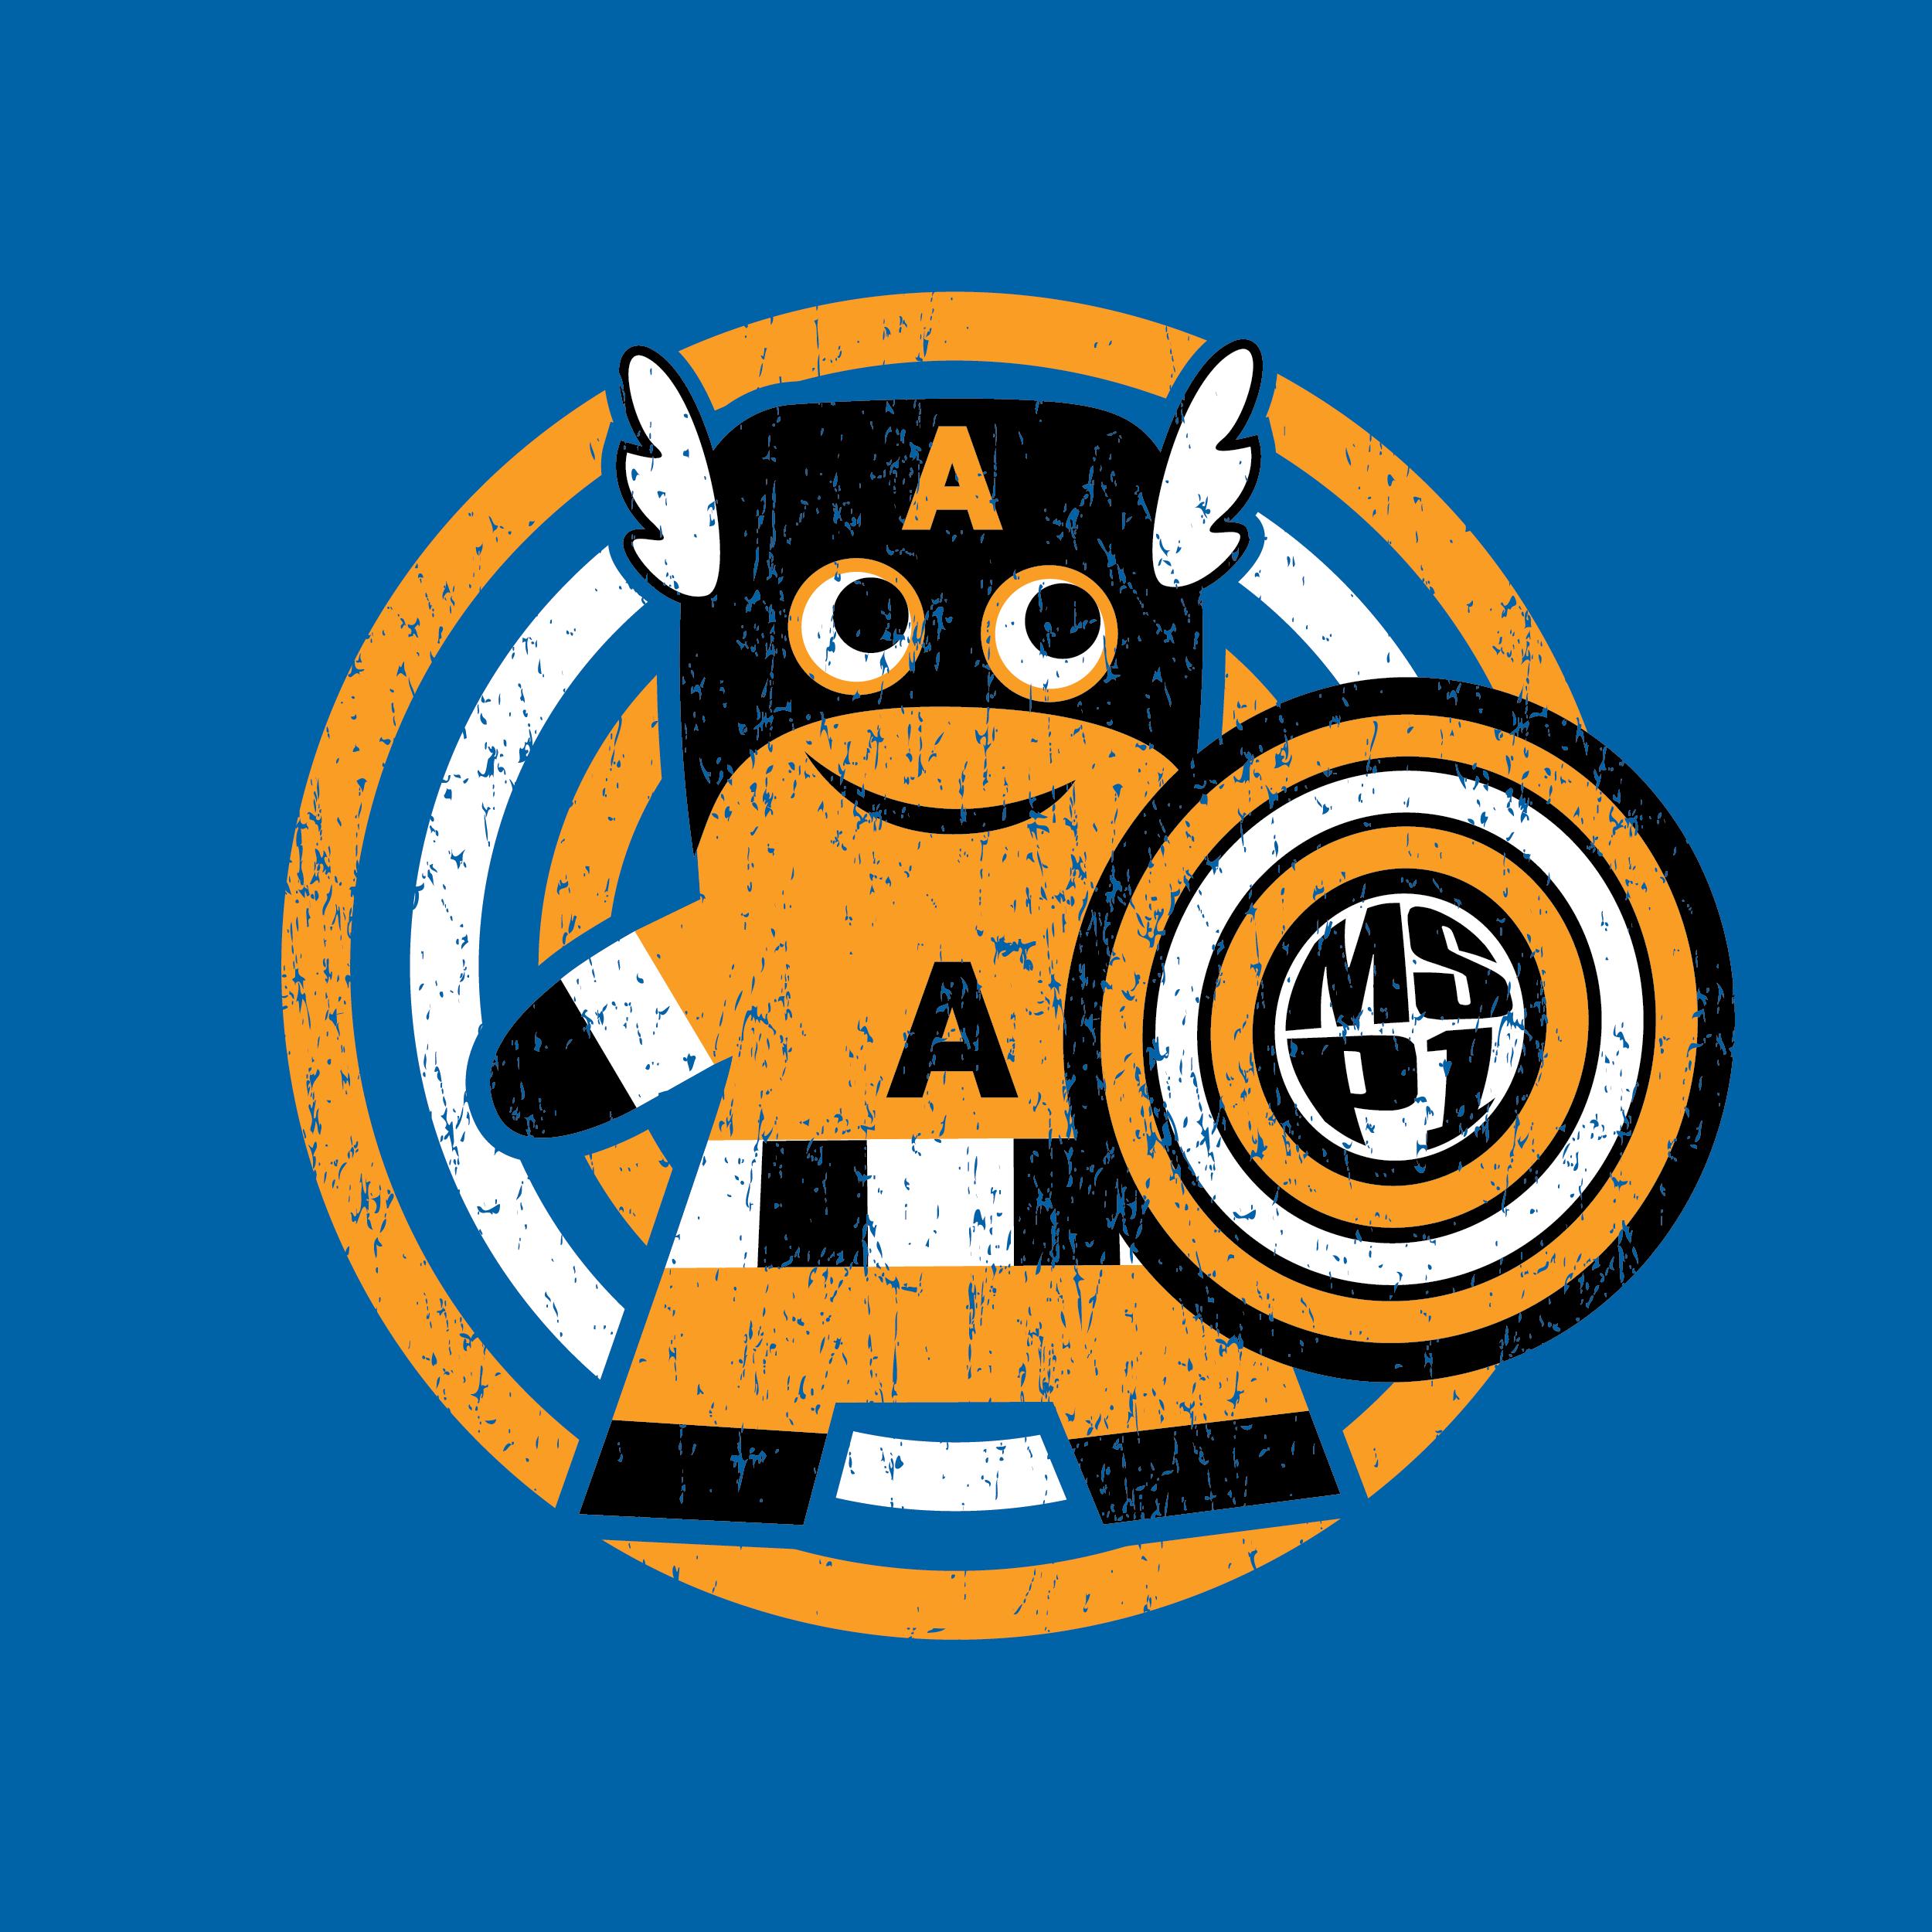 Amazon MSP1: Captain Amazon Shirt